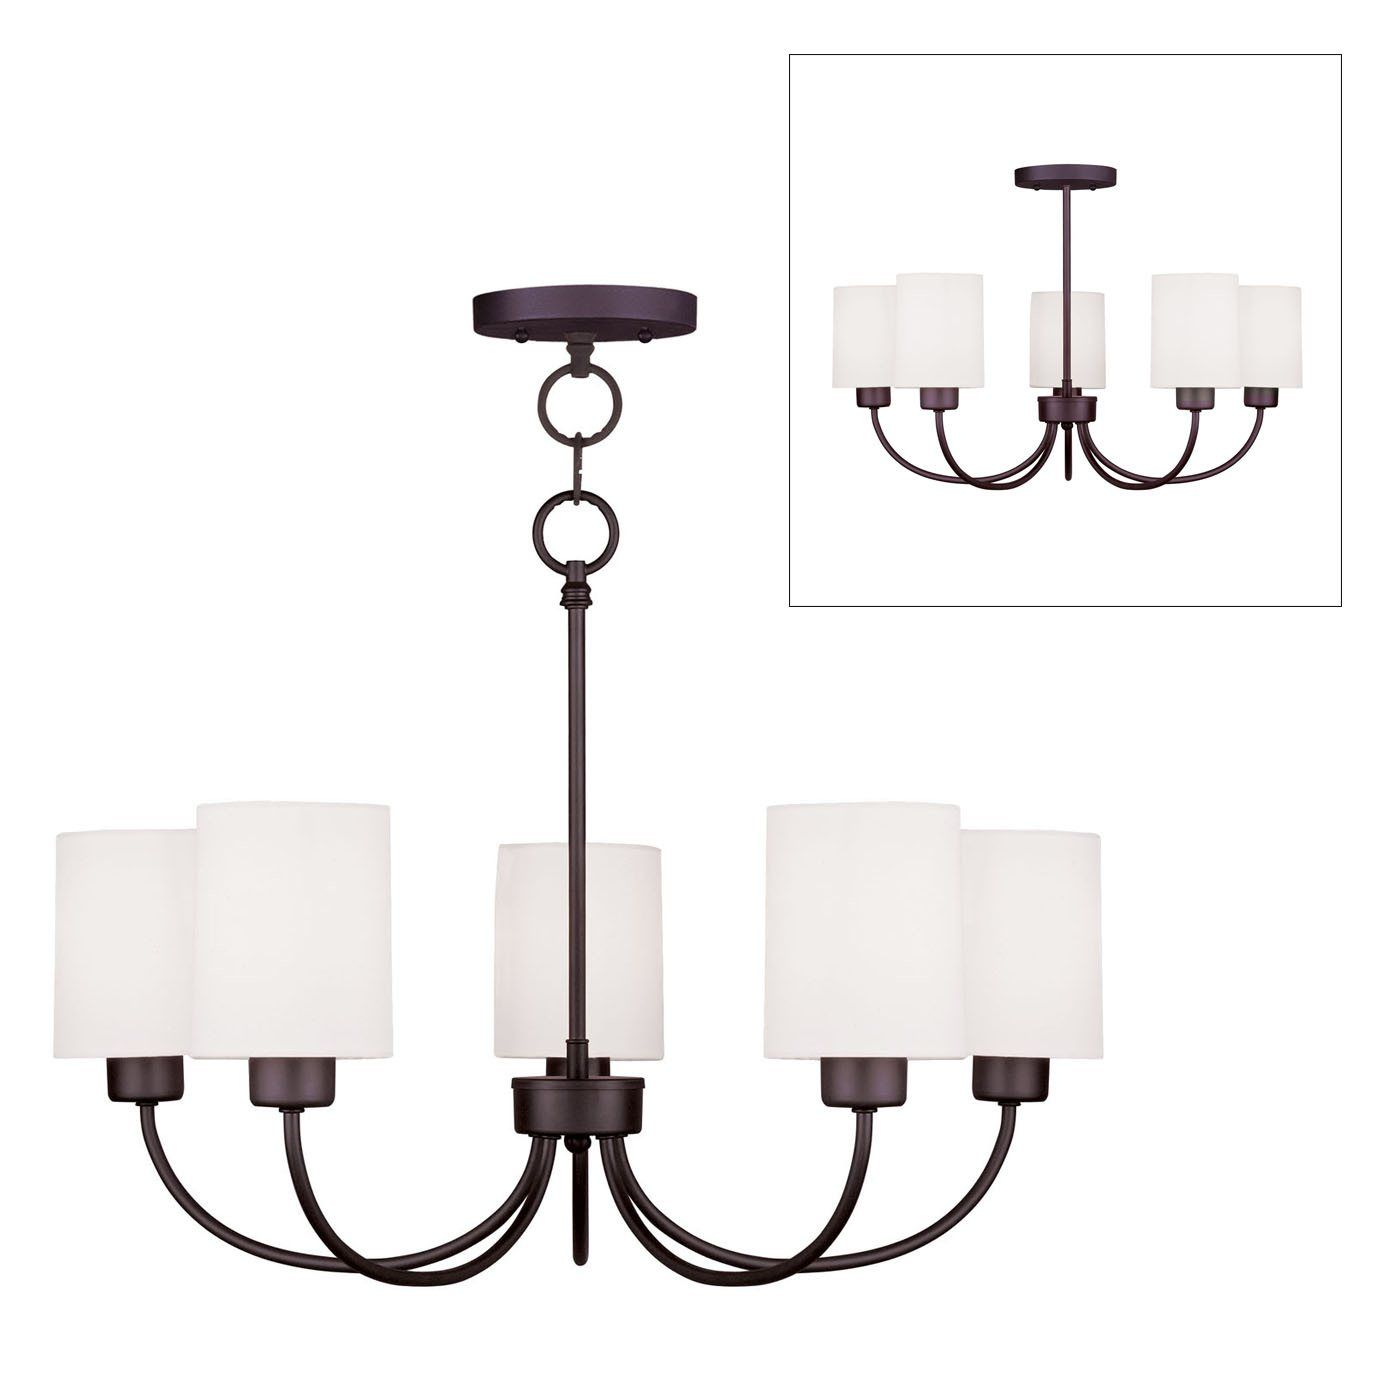 Livex Lighting 5265 Sus 5 Light Convertible Ceiling